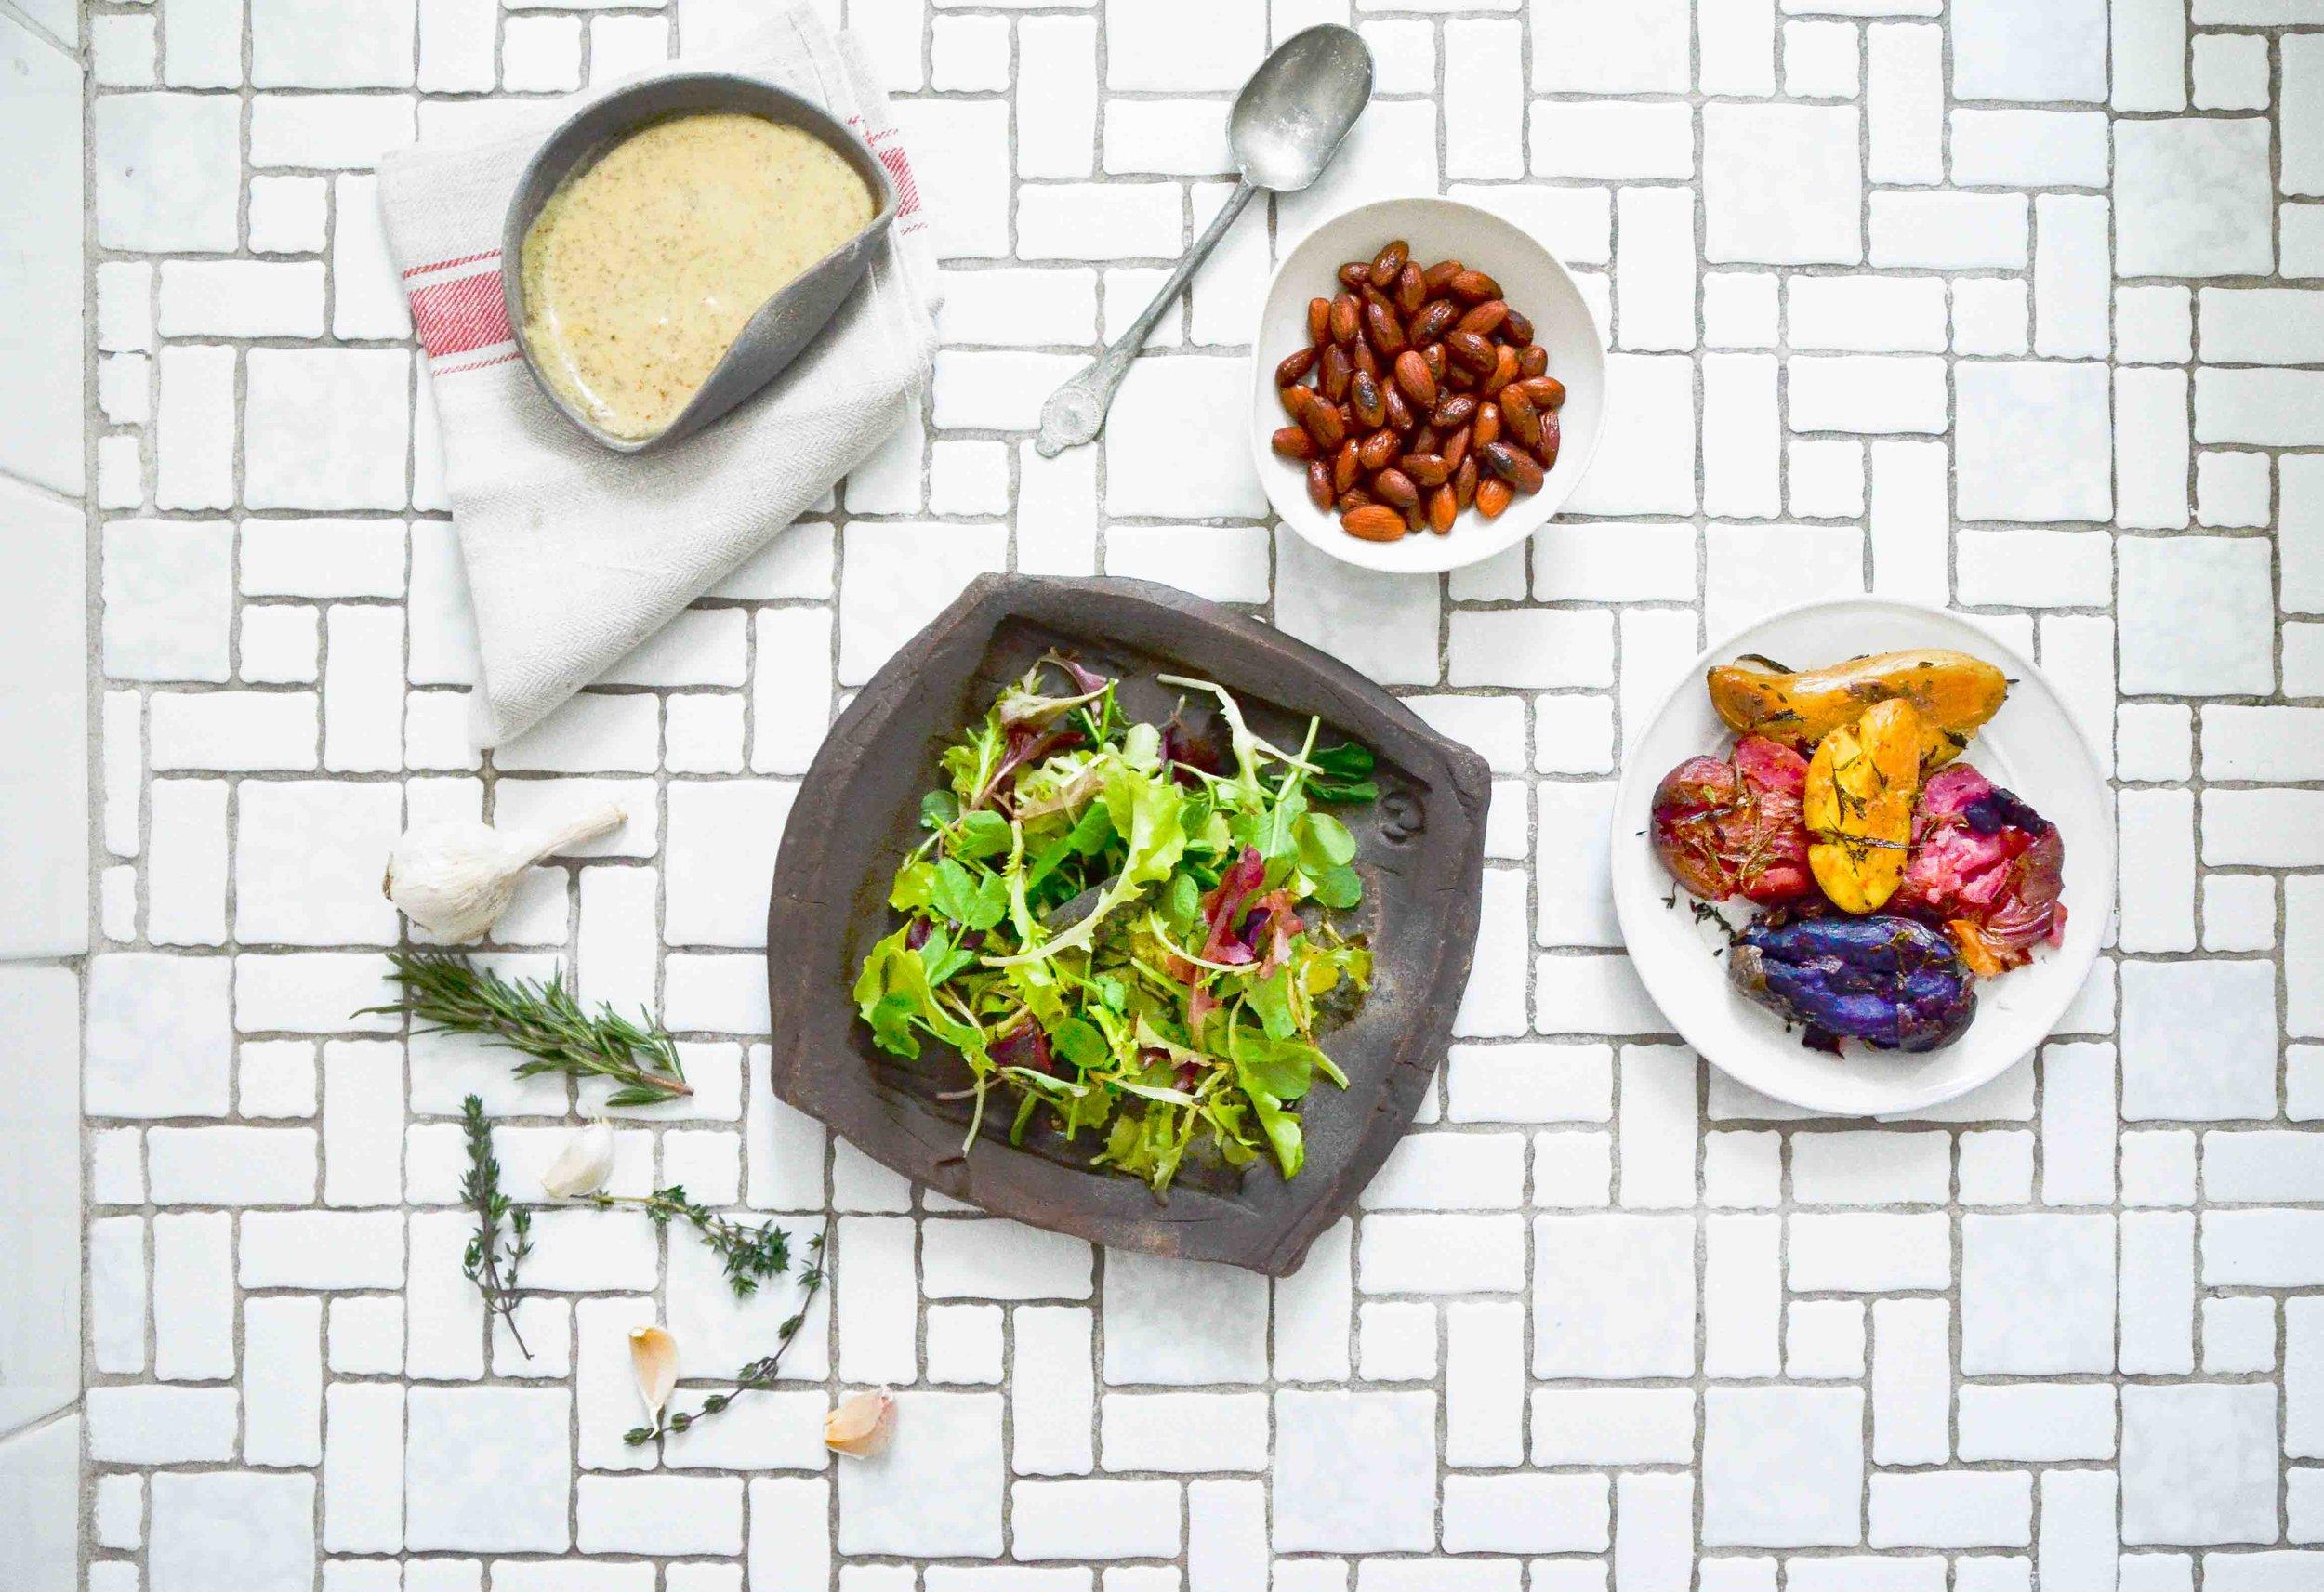 smashed potato + greens salad -fried parsley